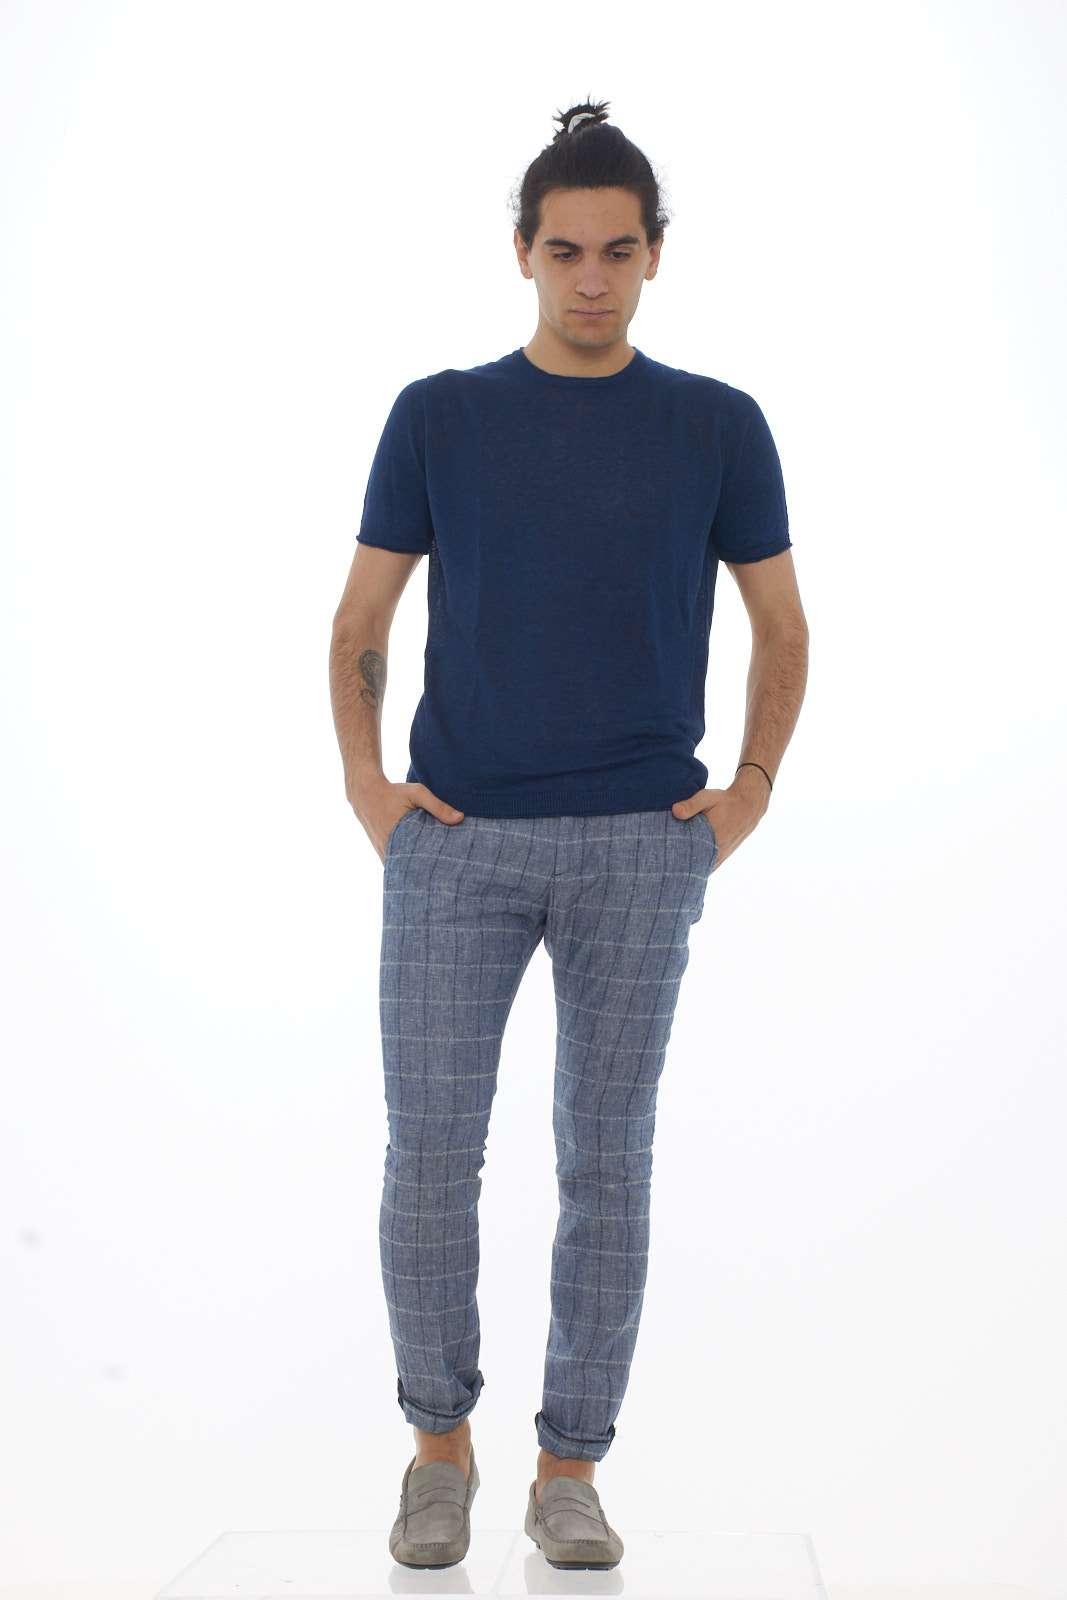 https://www.parmax.com/media/catalog/product/a/i/PE-outlet_parmax-t-shirt-uomo-Kangra-9EK7013-D.jpg